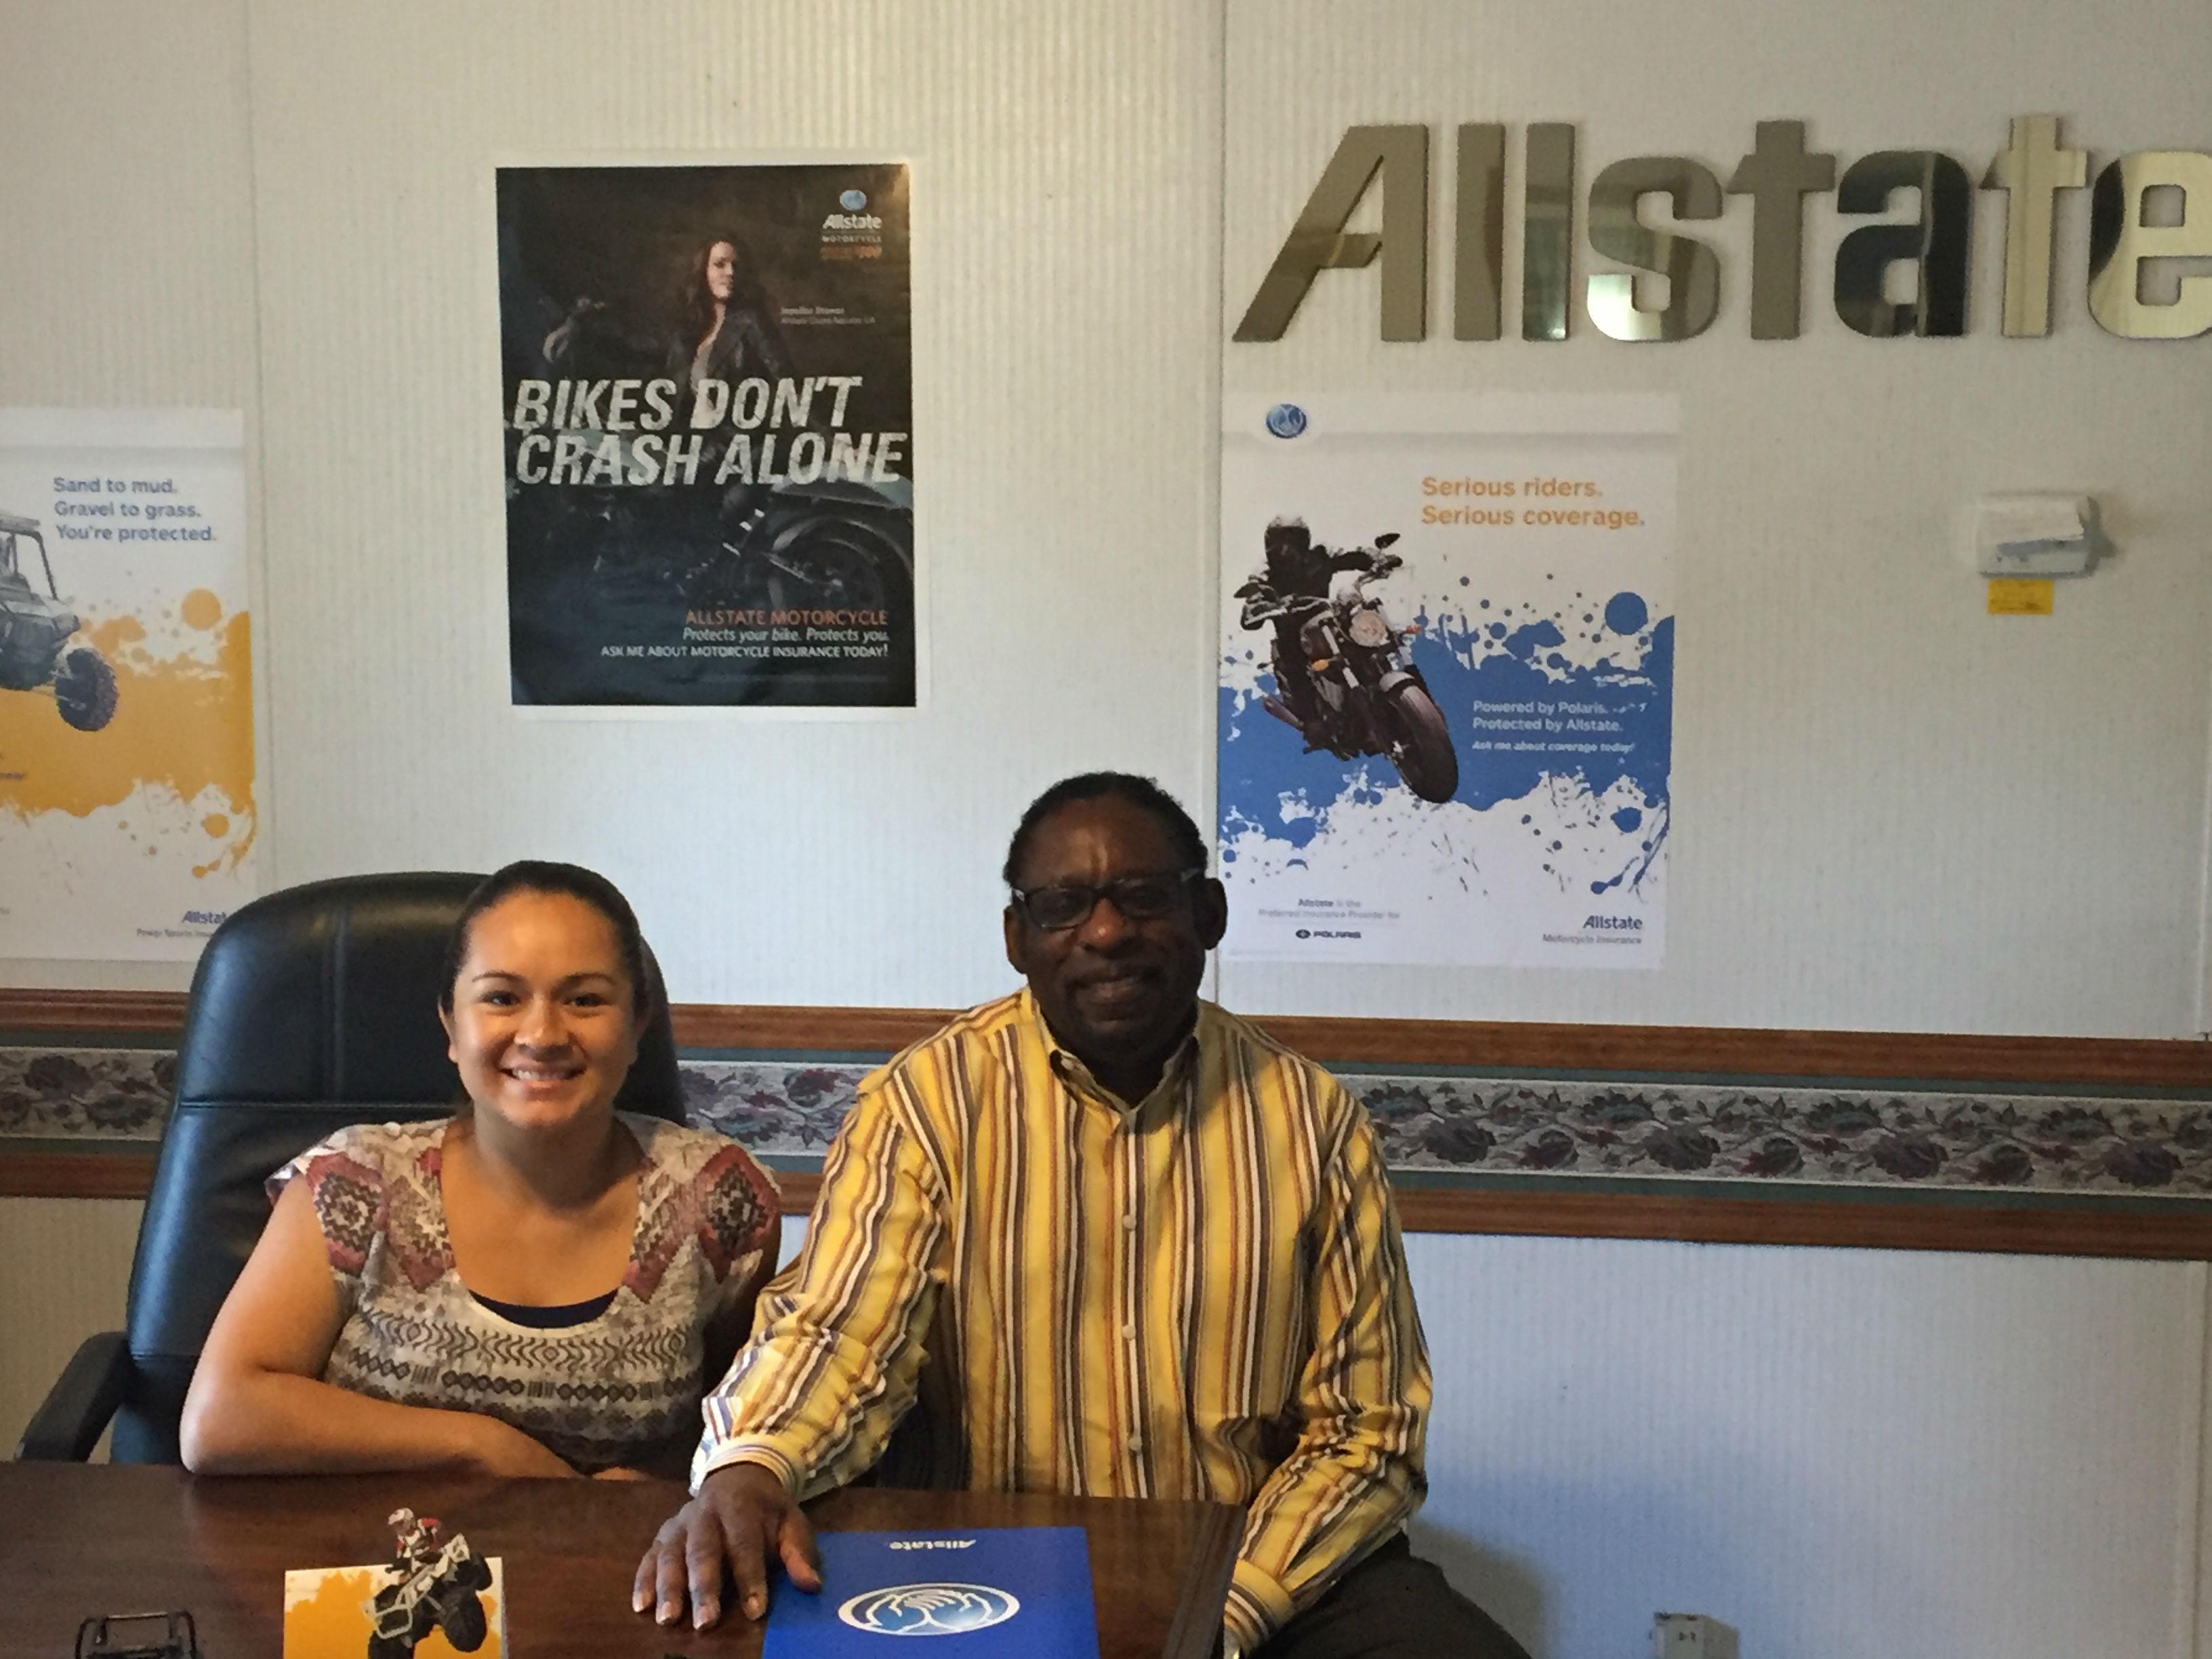 Damon Mitchell: Allstate Insurance image 3